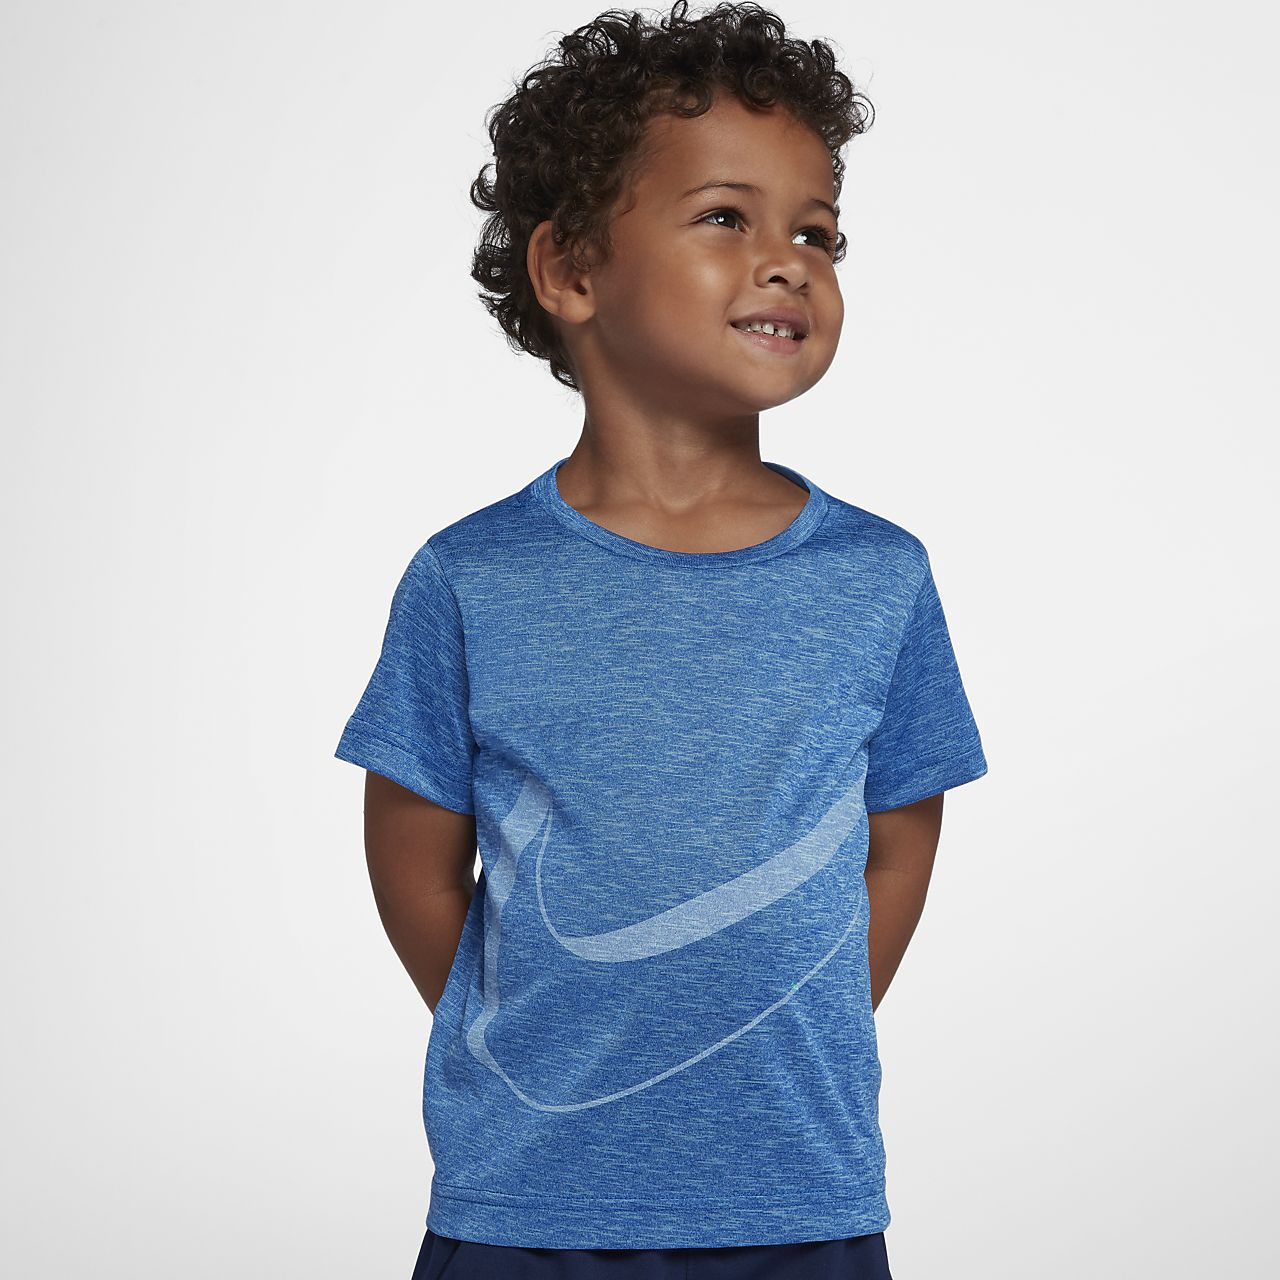 Nike Breathe T-Shirt für jüngere Kinder